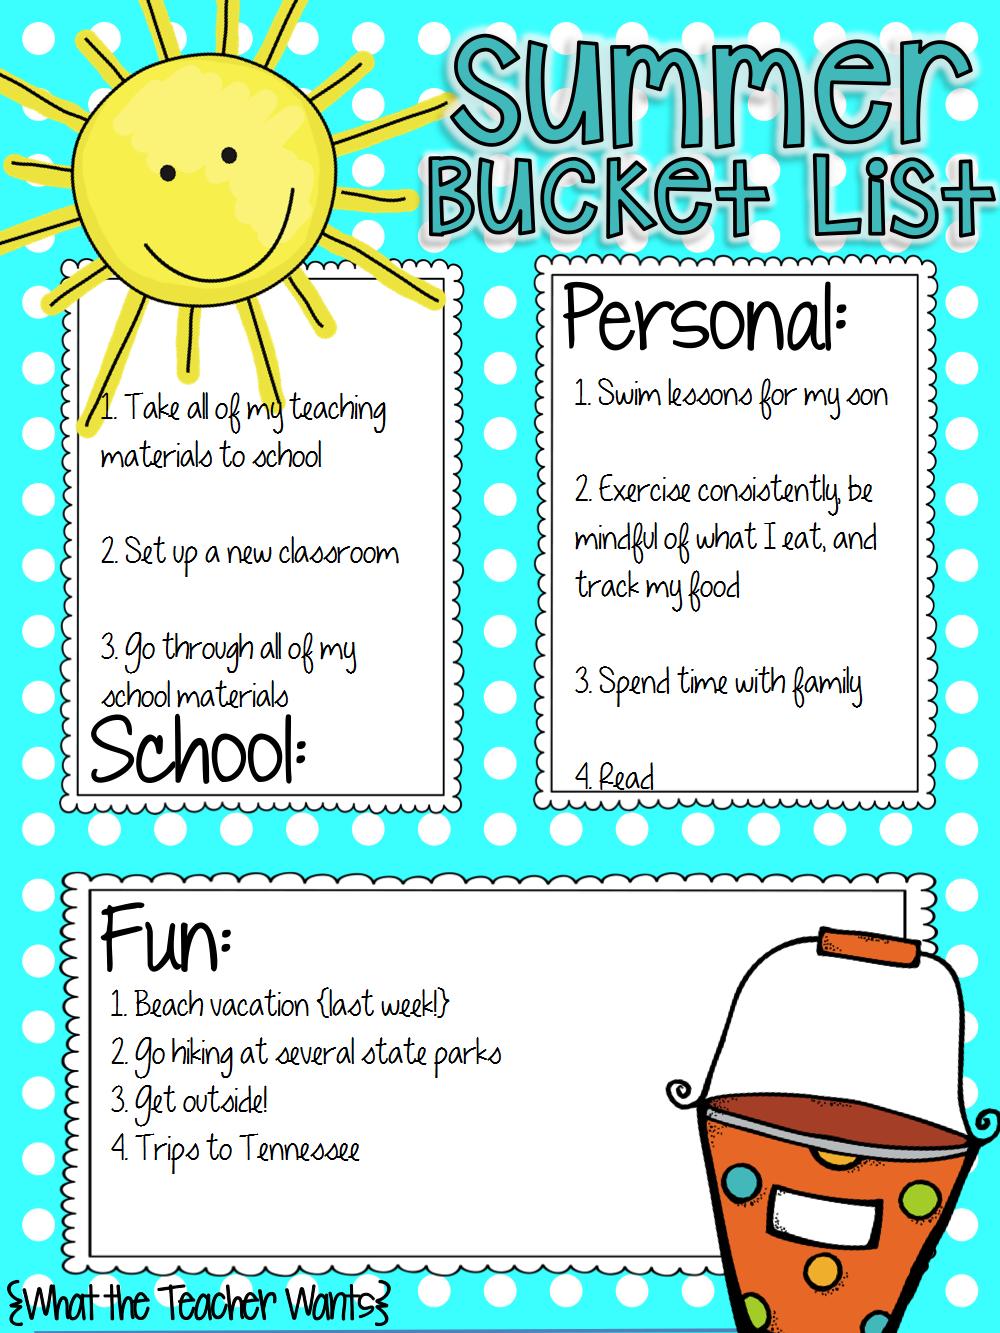 Summer Bucket List - For the Love of Teaching